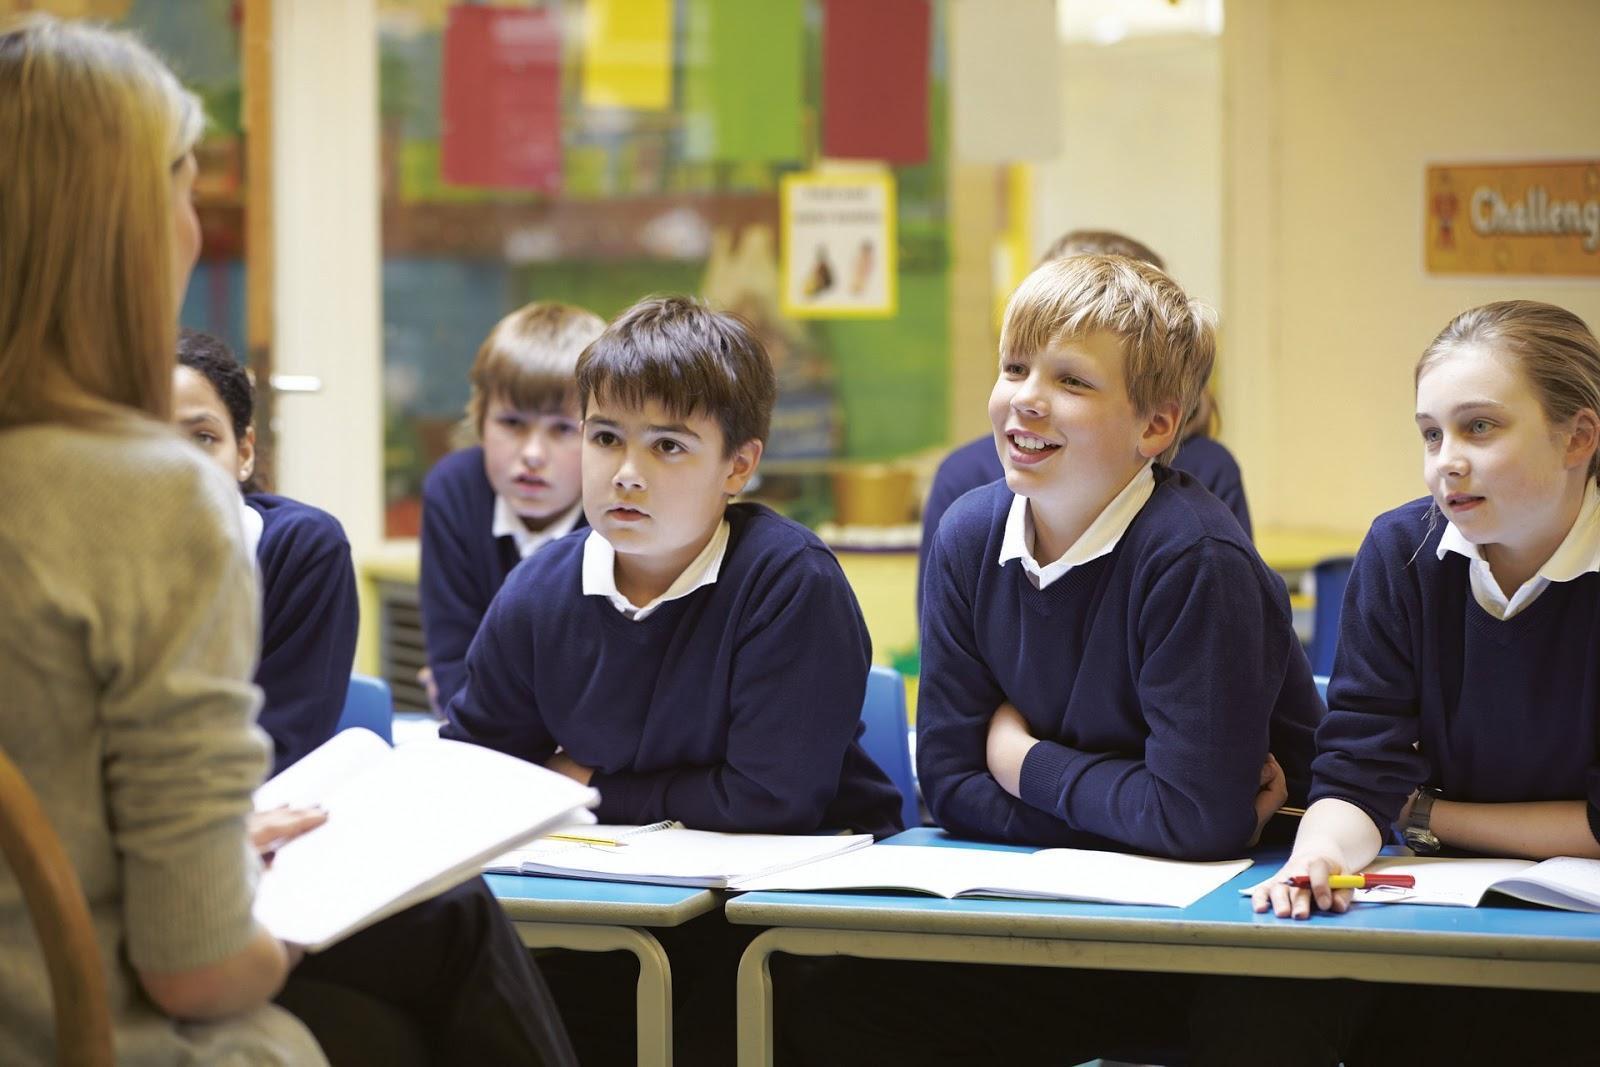 Students enjoying their teacher's lesson.